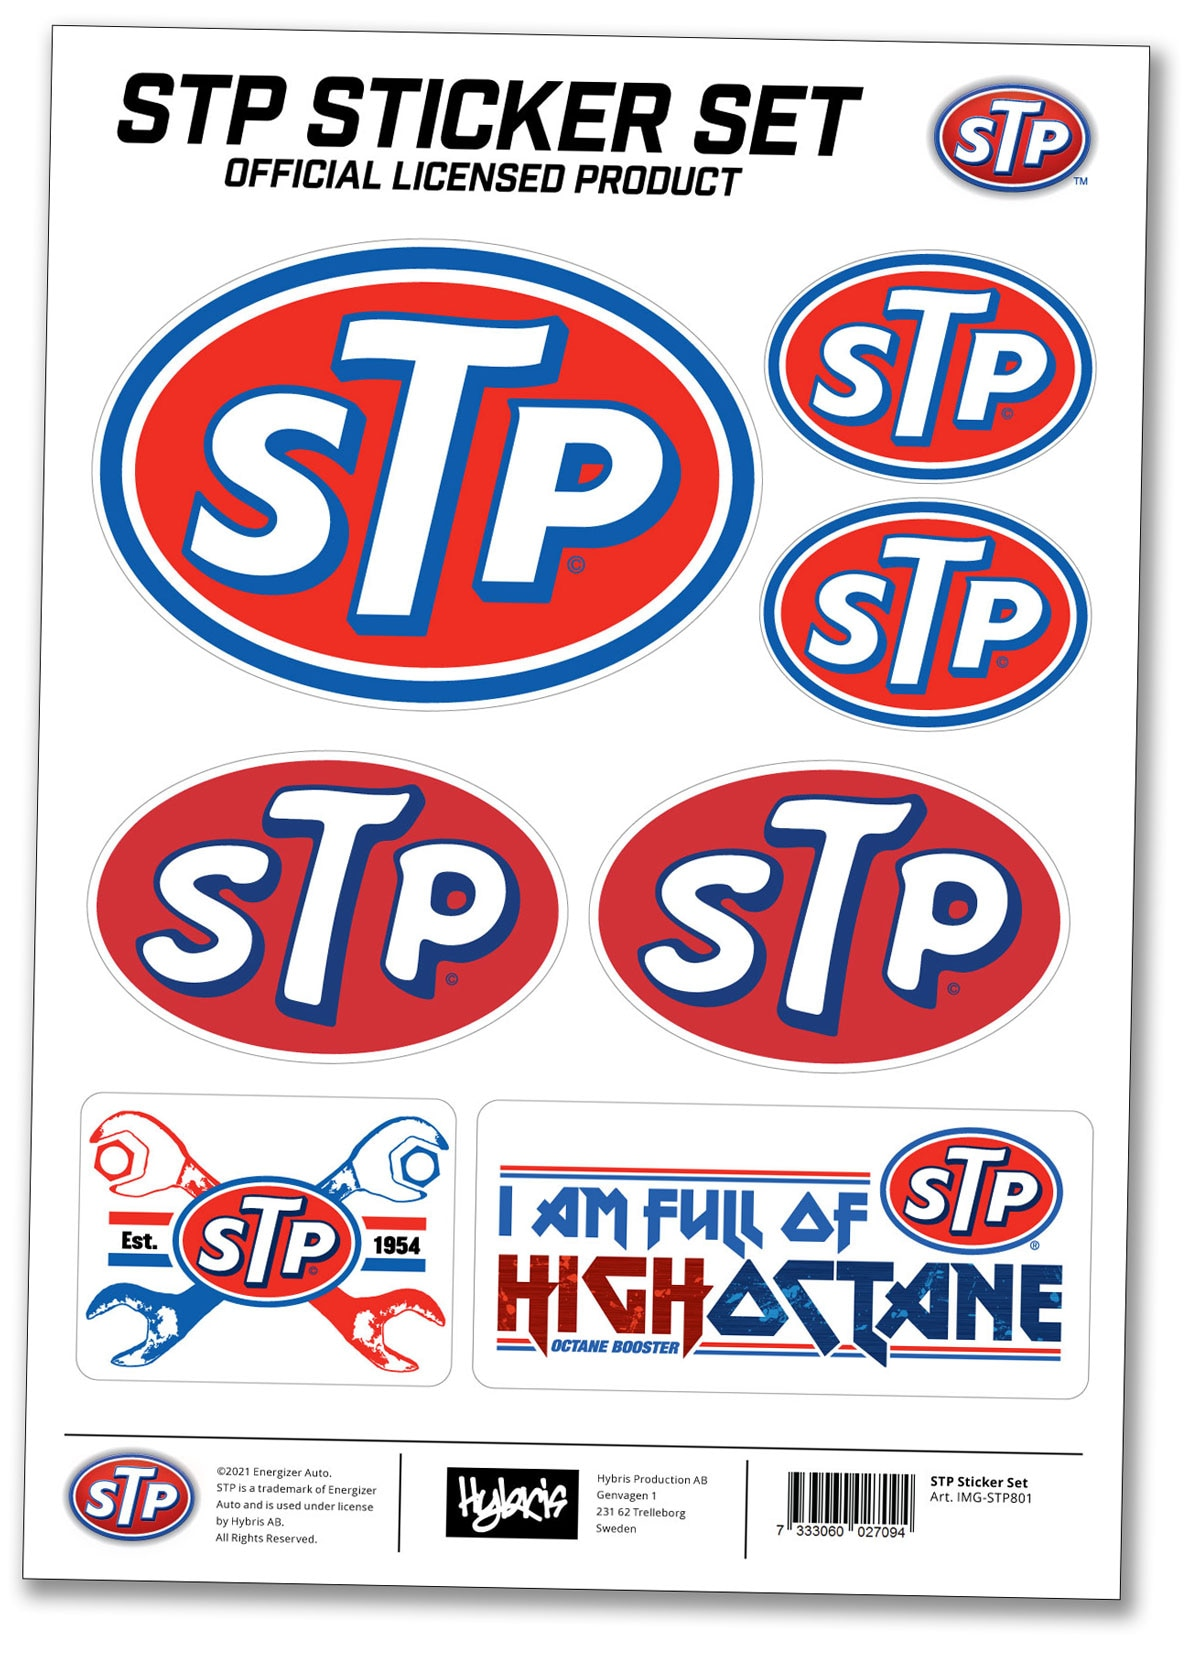 STP Brand Sticker Set